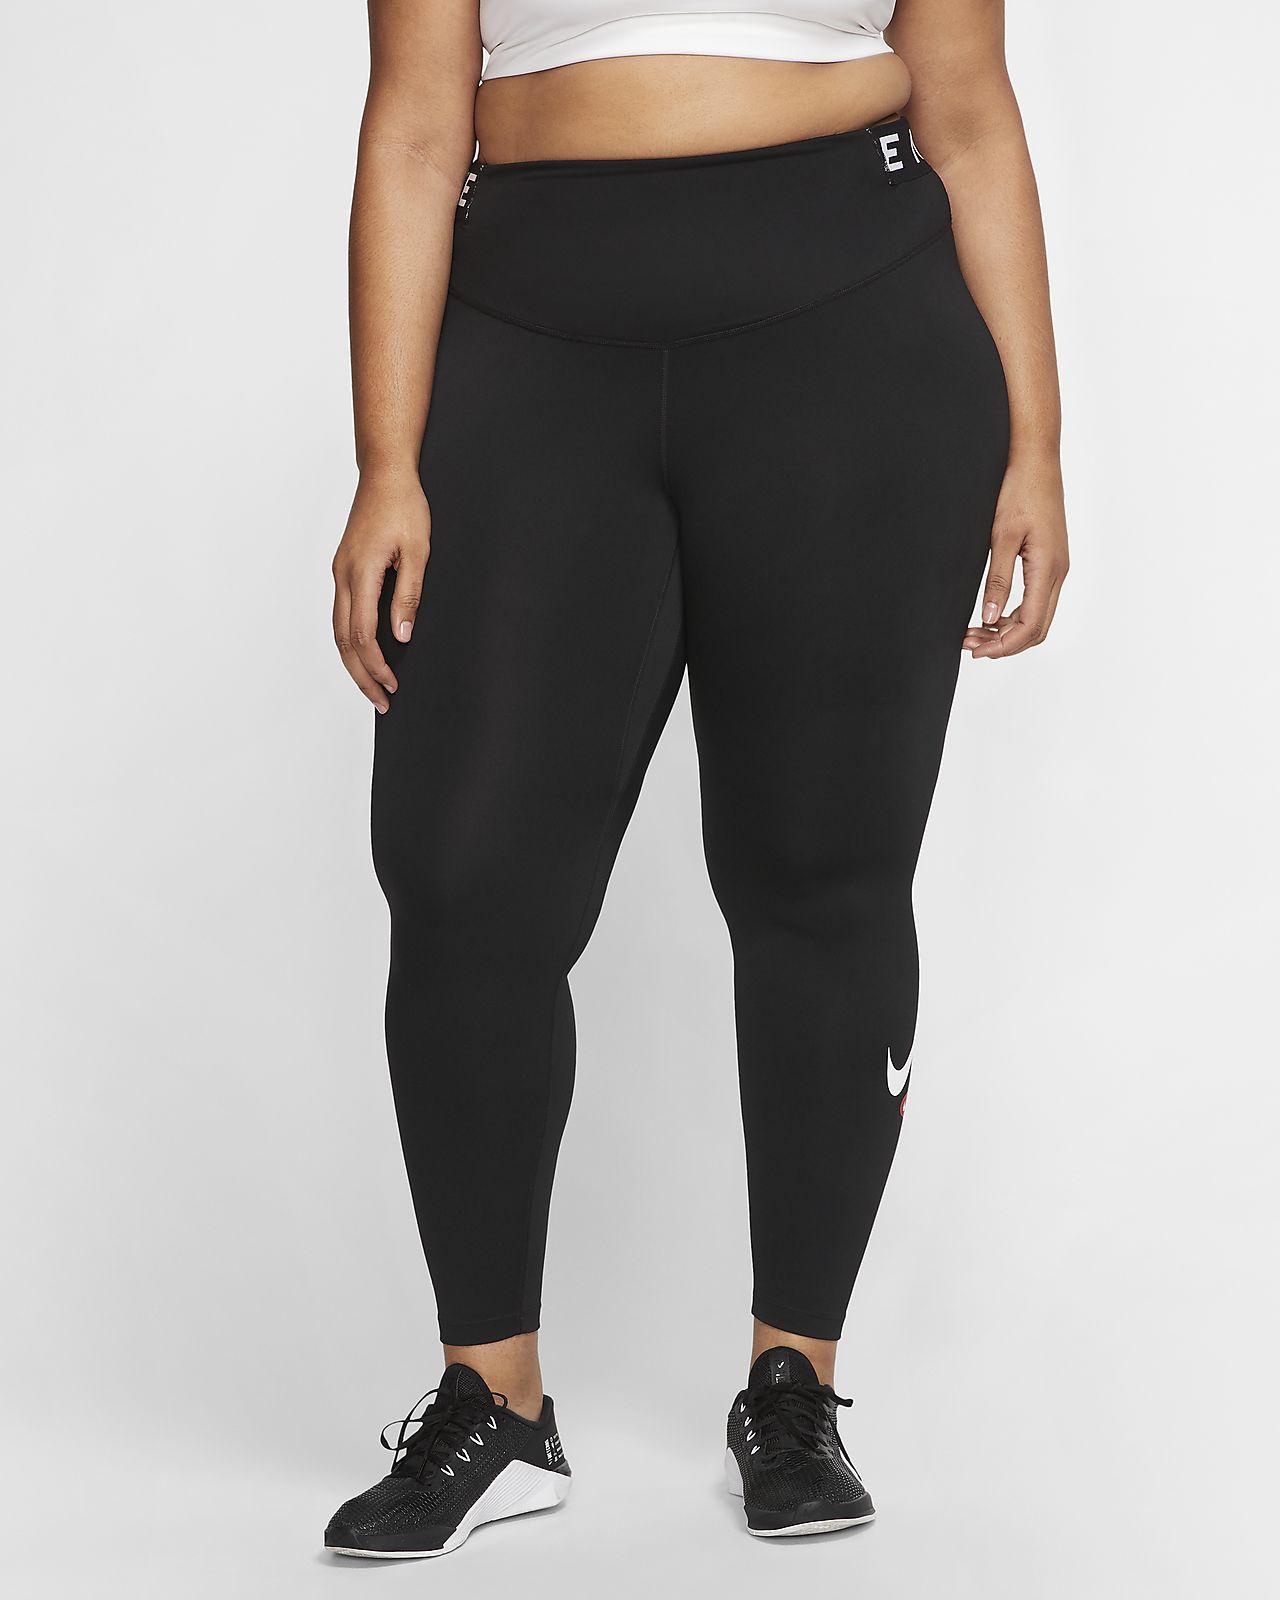 Dame Store størrelser Bukser og tights. Nike NO